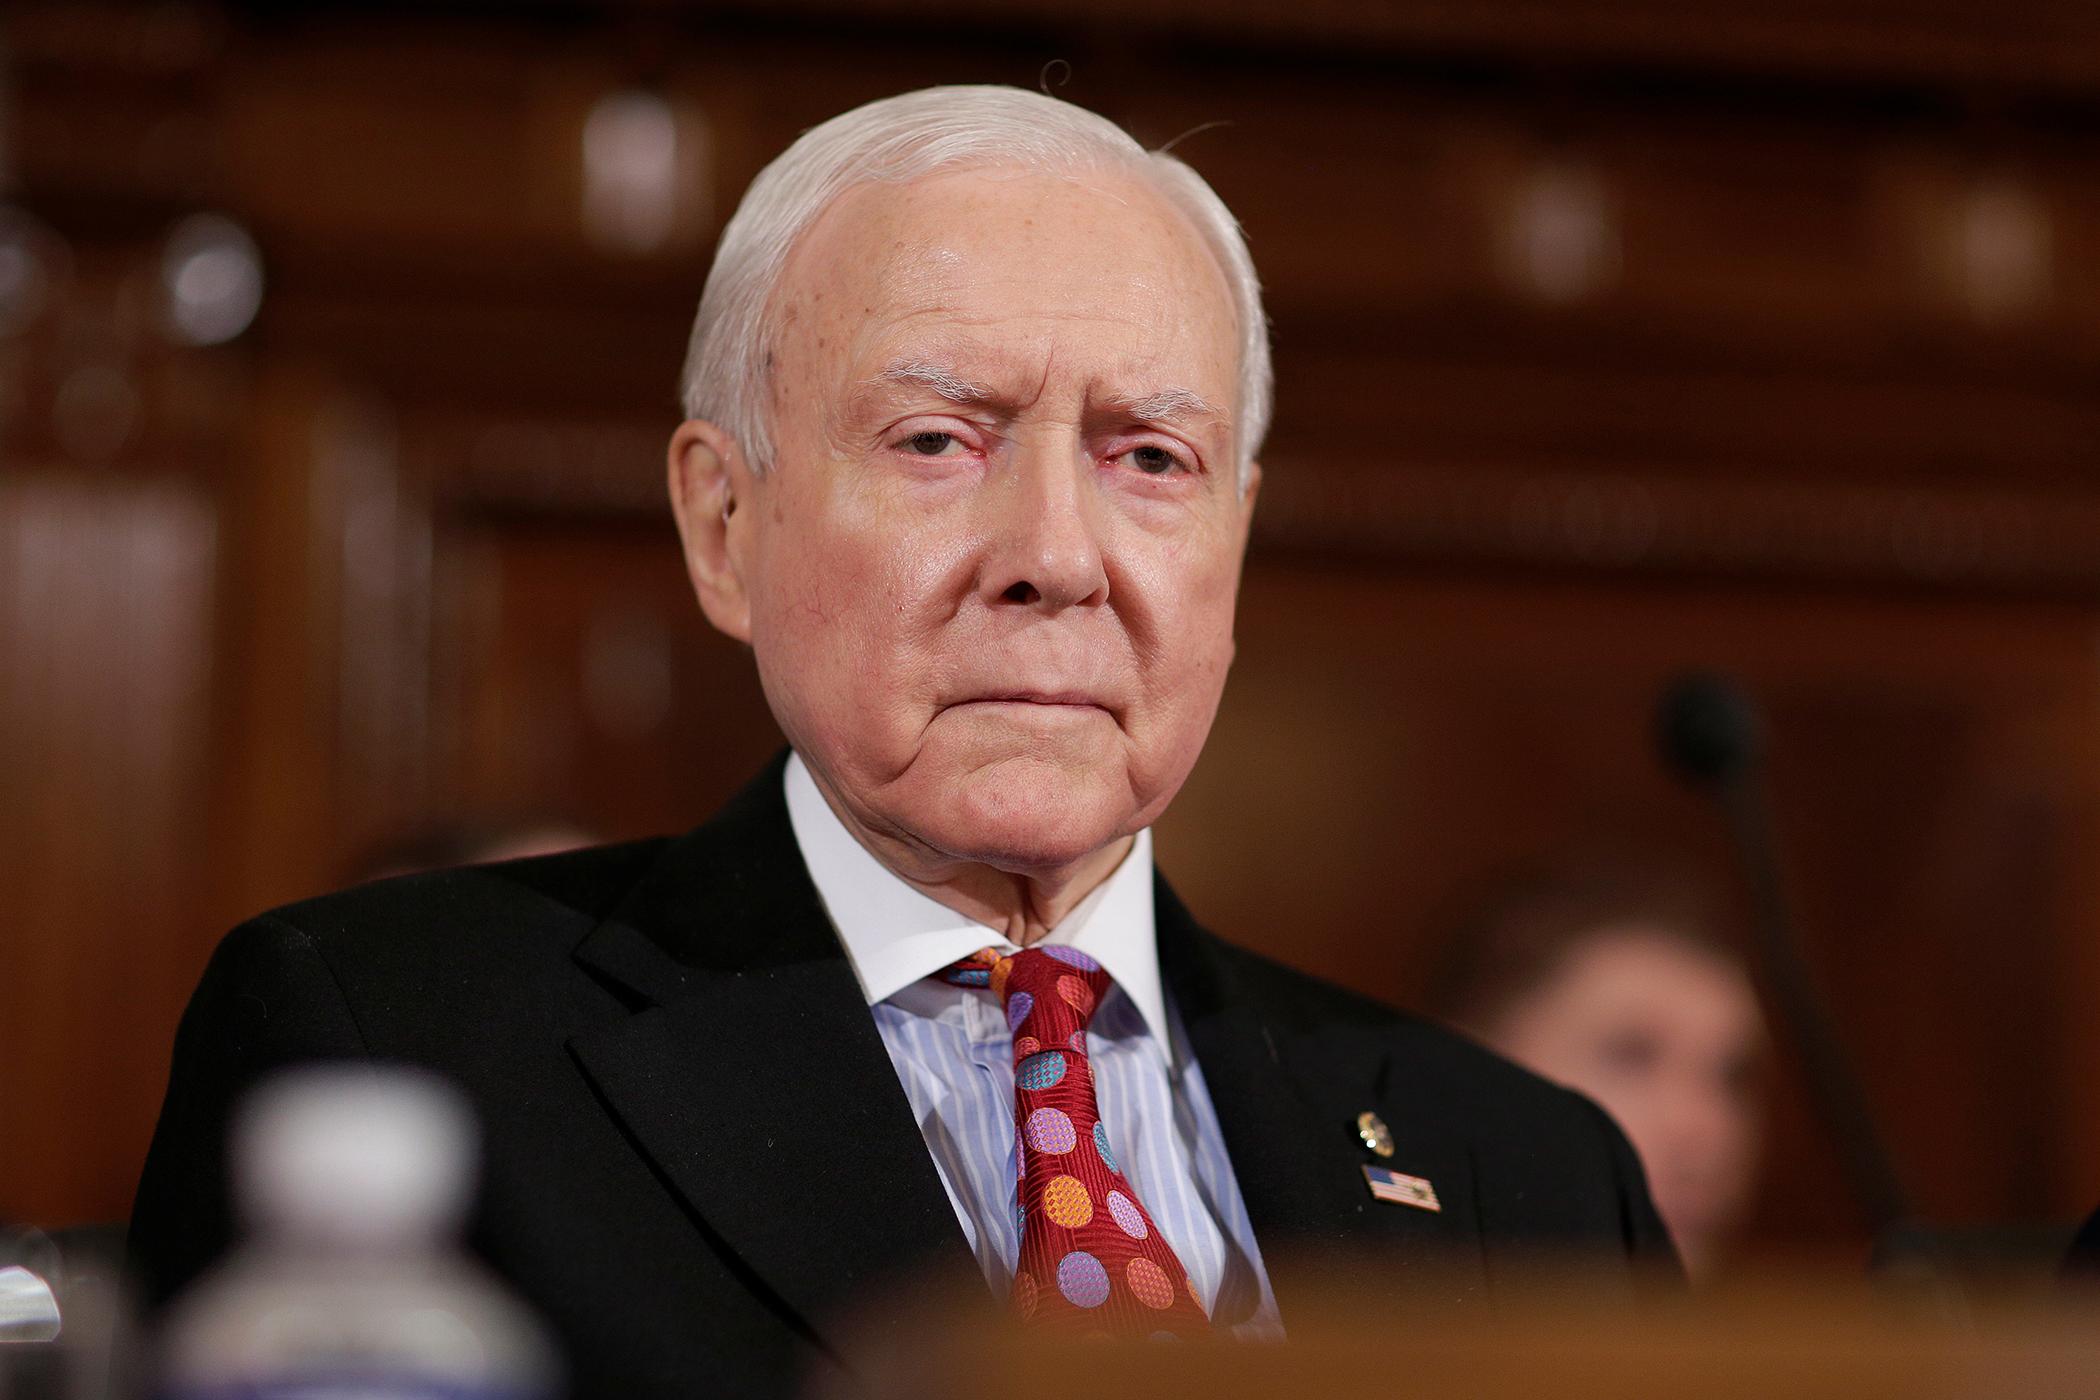 170620-senators-health-care-hatch